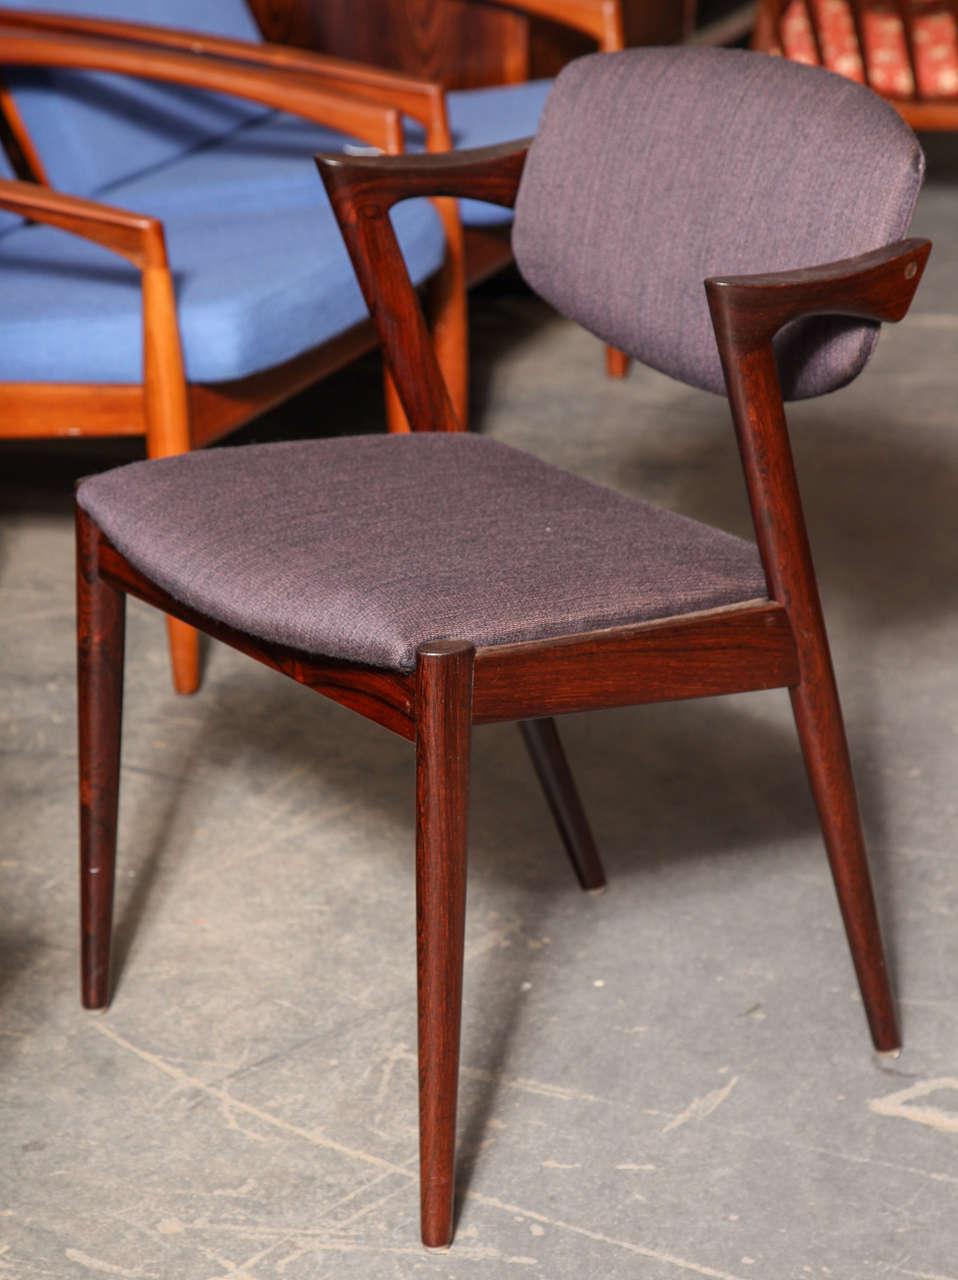 Kai kristiansen no 42 dining chair rosewood set of six at 1stdibs - Kai kristiansen chair ...